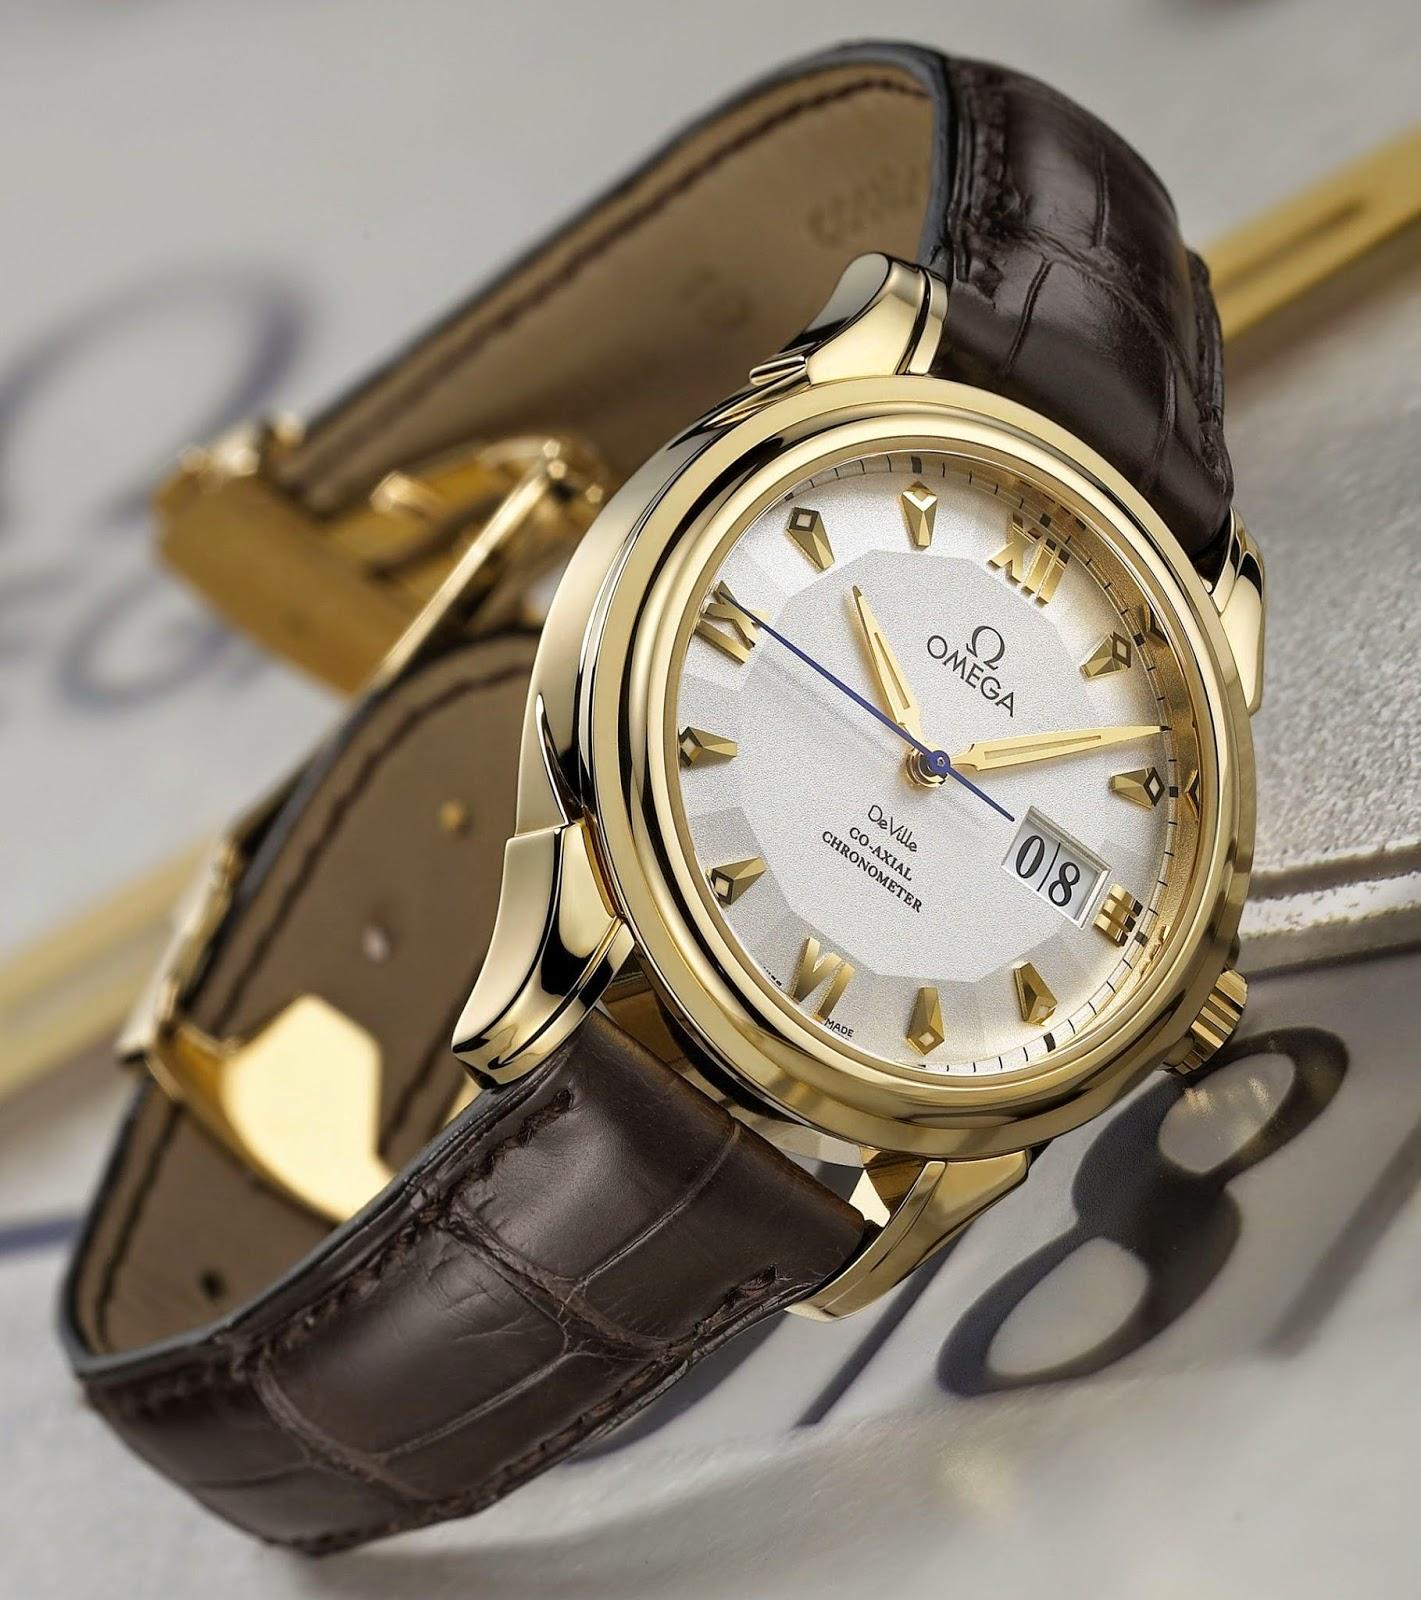 Omega - De Ville Co-Axial Big Date watch yellow gold case